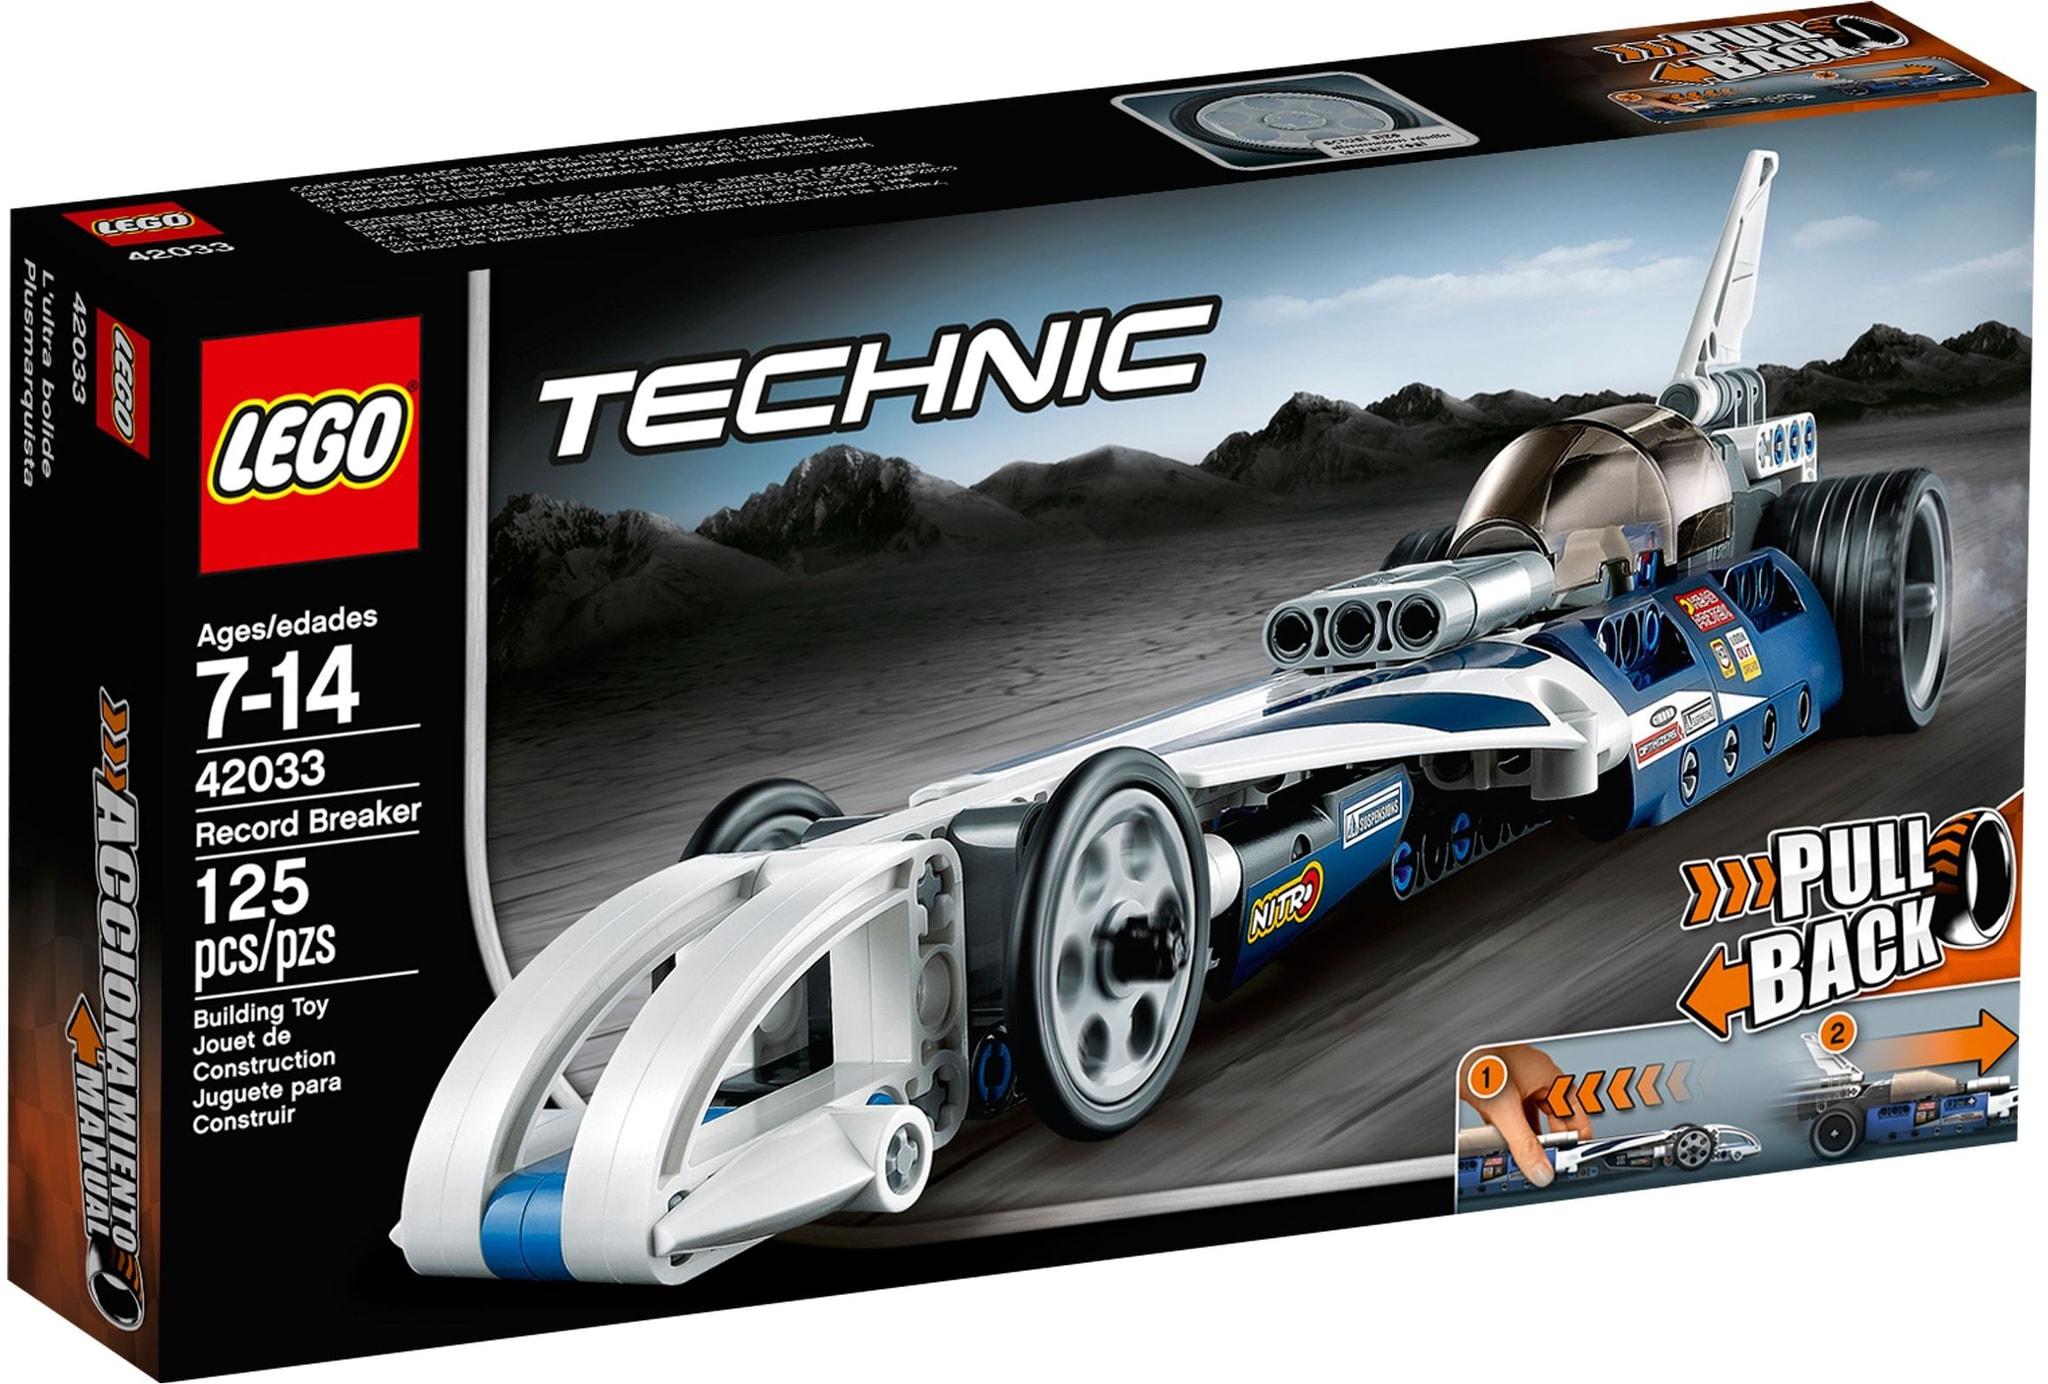 LEGO 42033 - Technic - Record Breaker